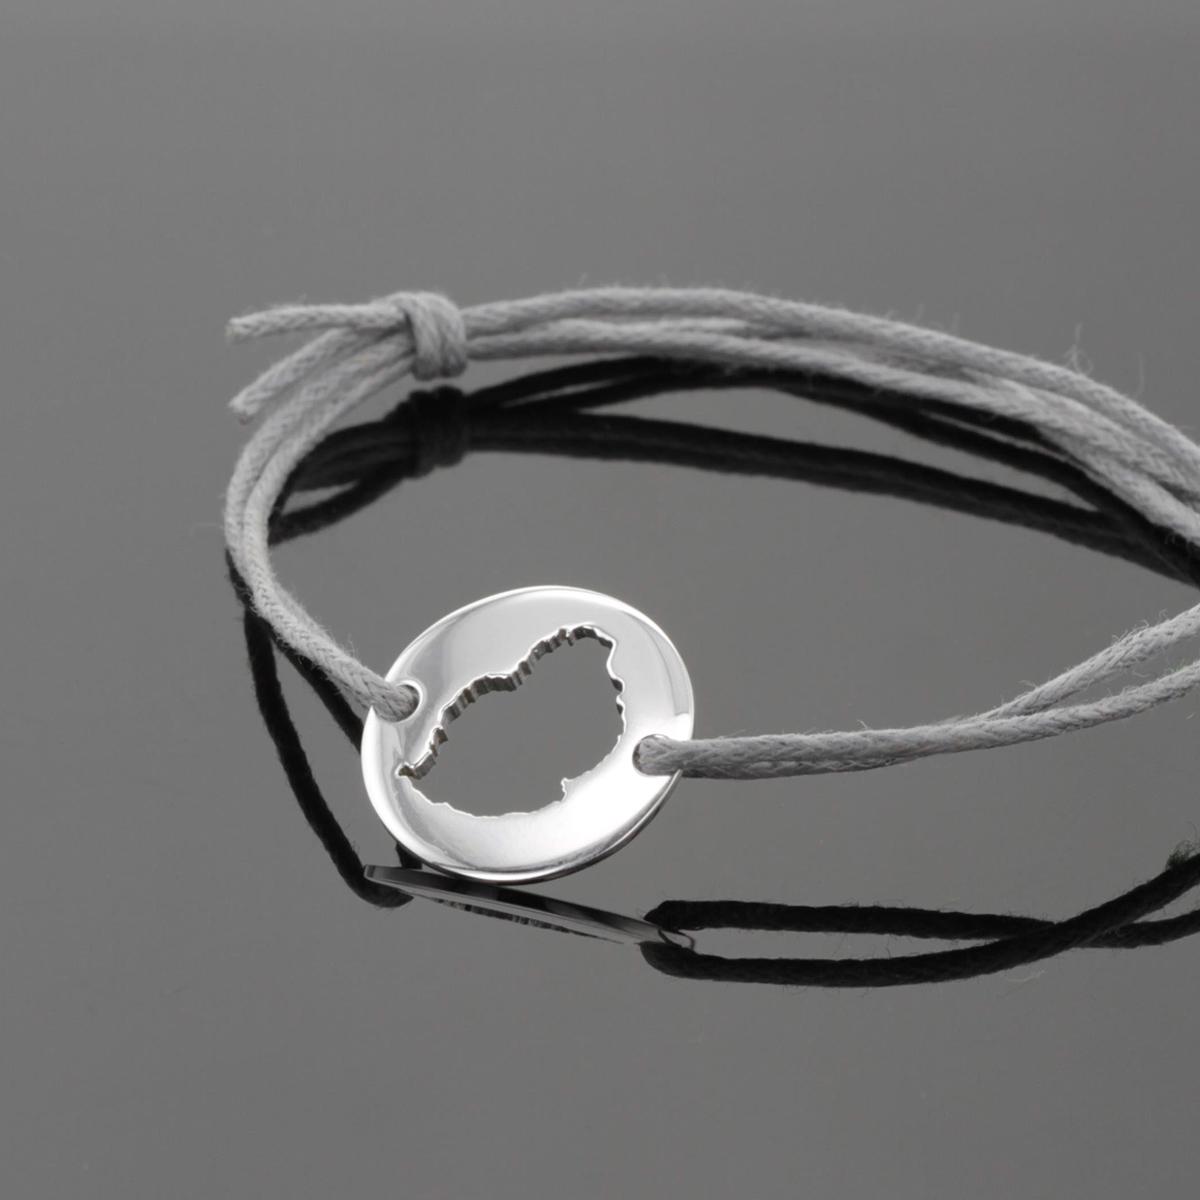 Silver jewellery souvenirs